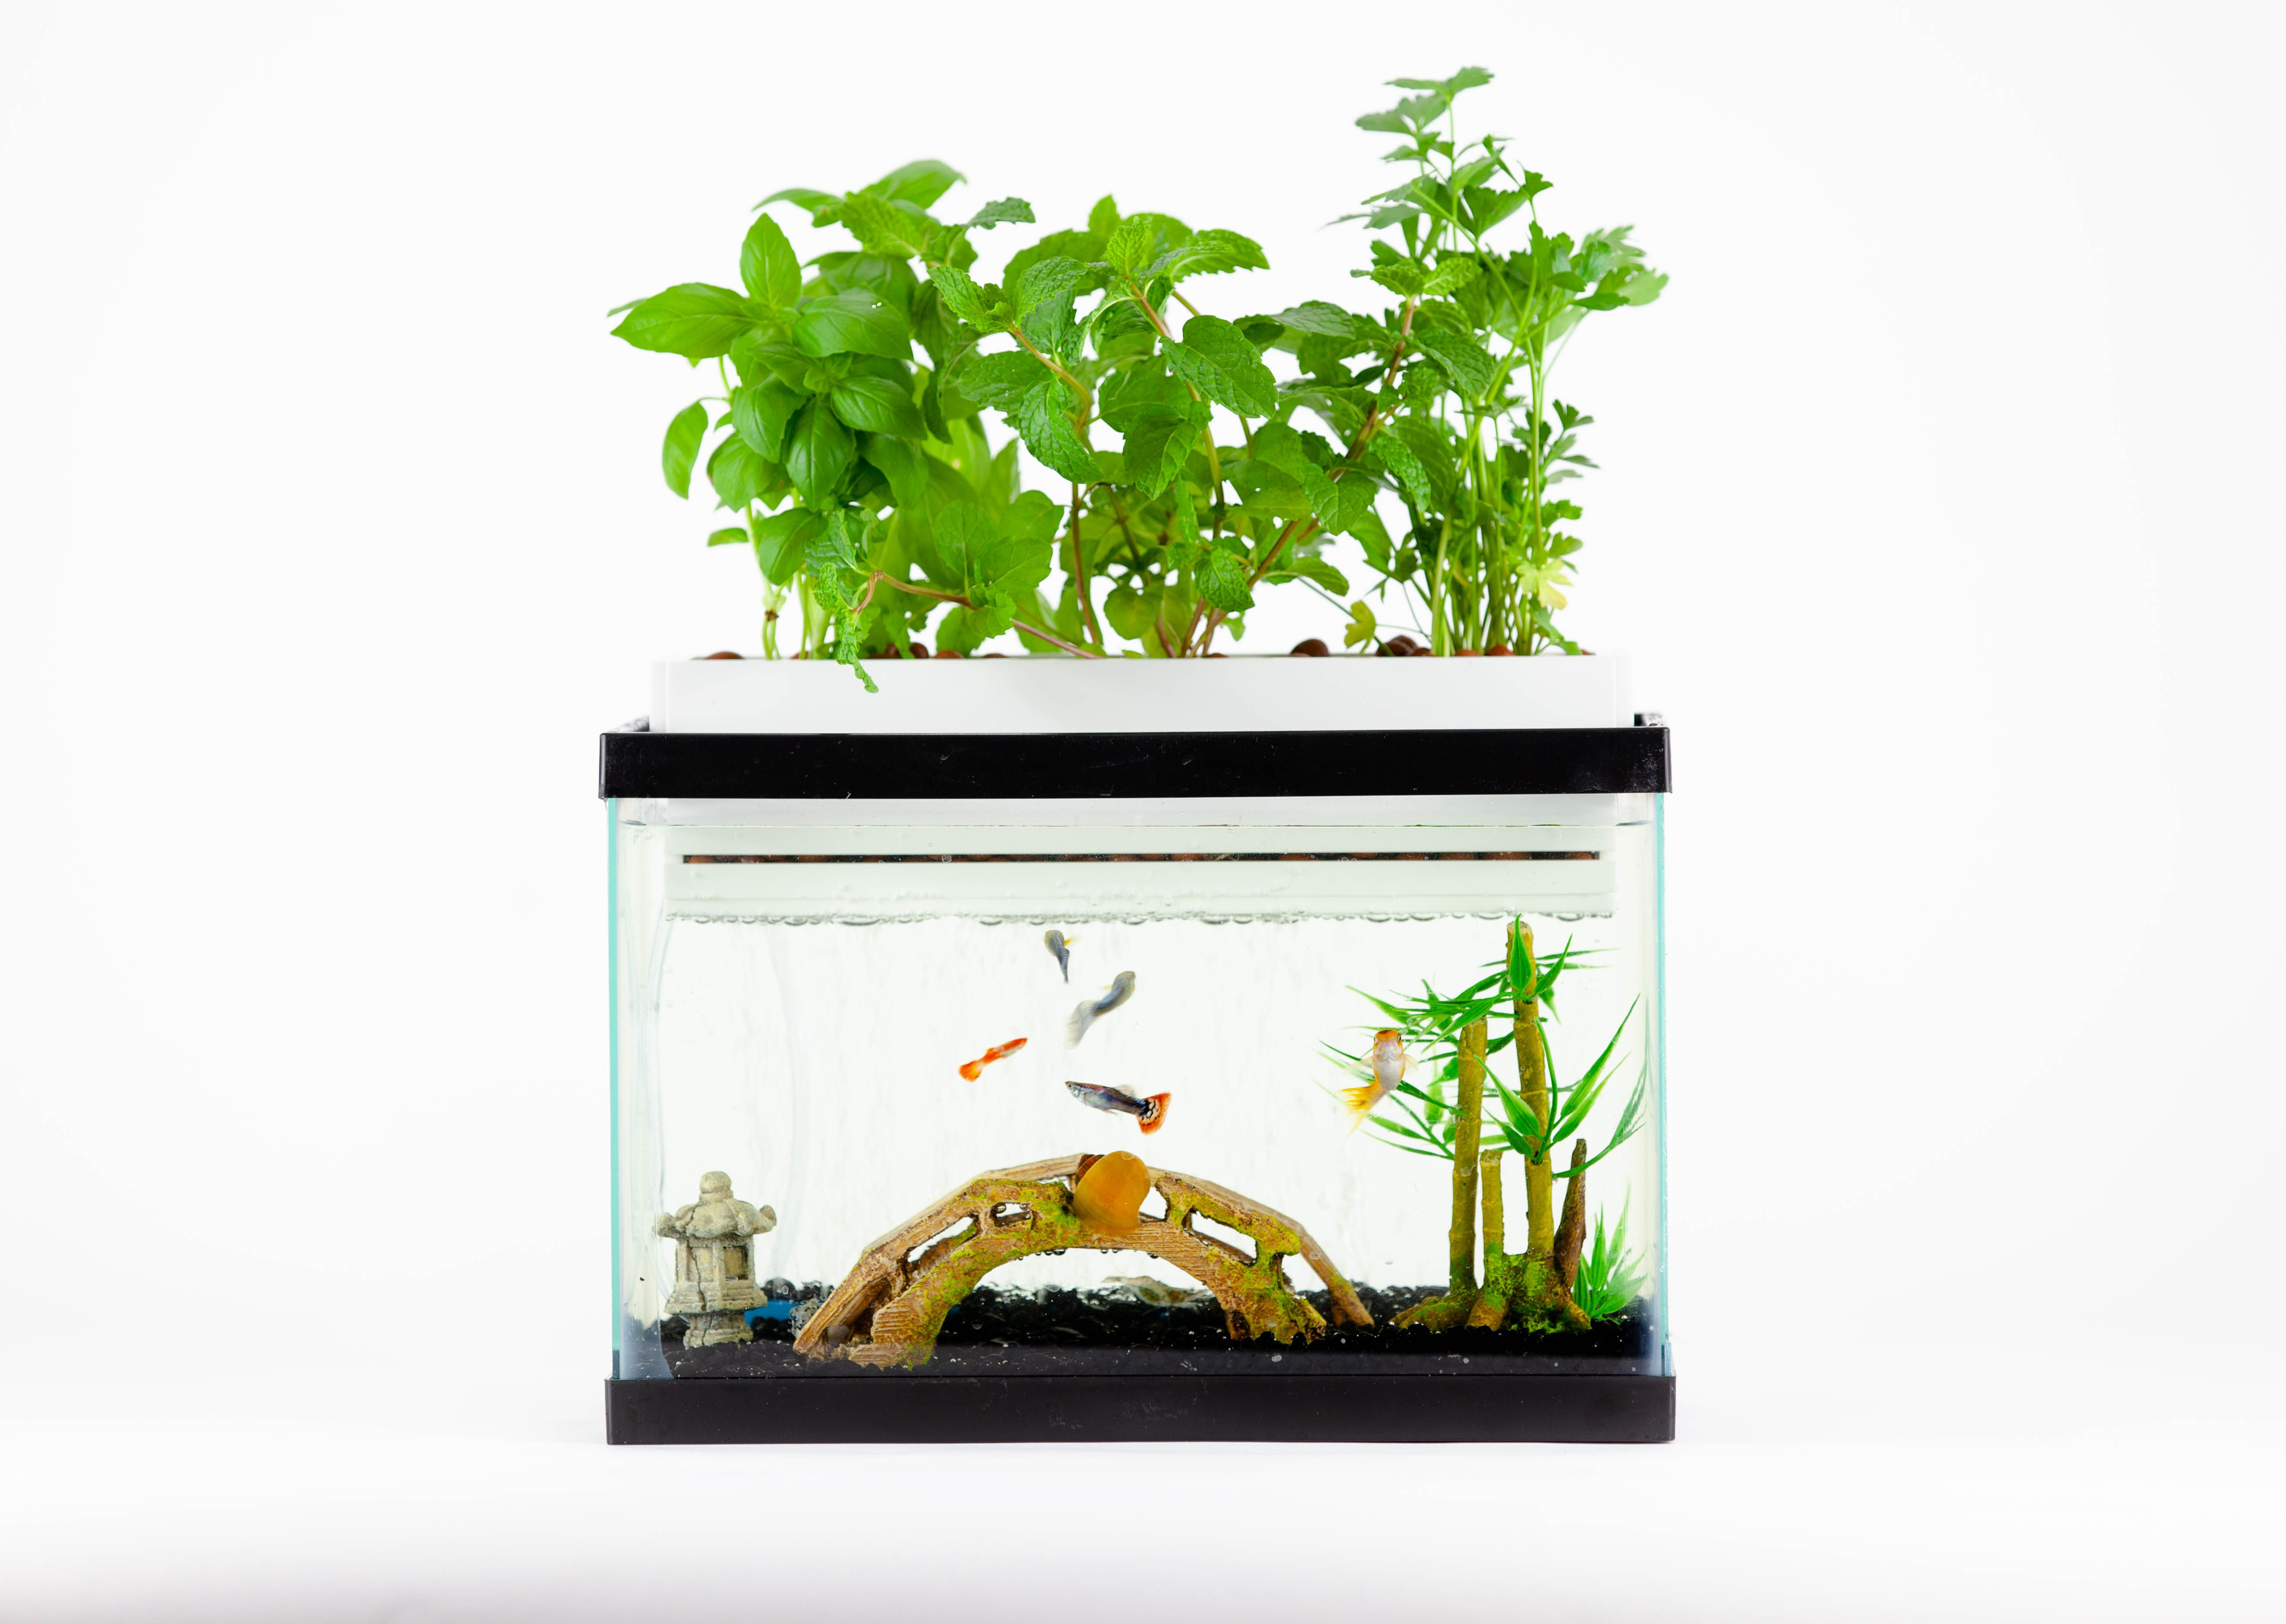 Turn Your Aquarium Into a Herb Garden! Indoor aquaponics